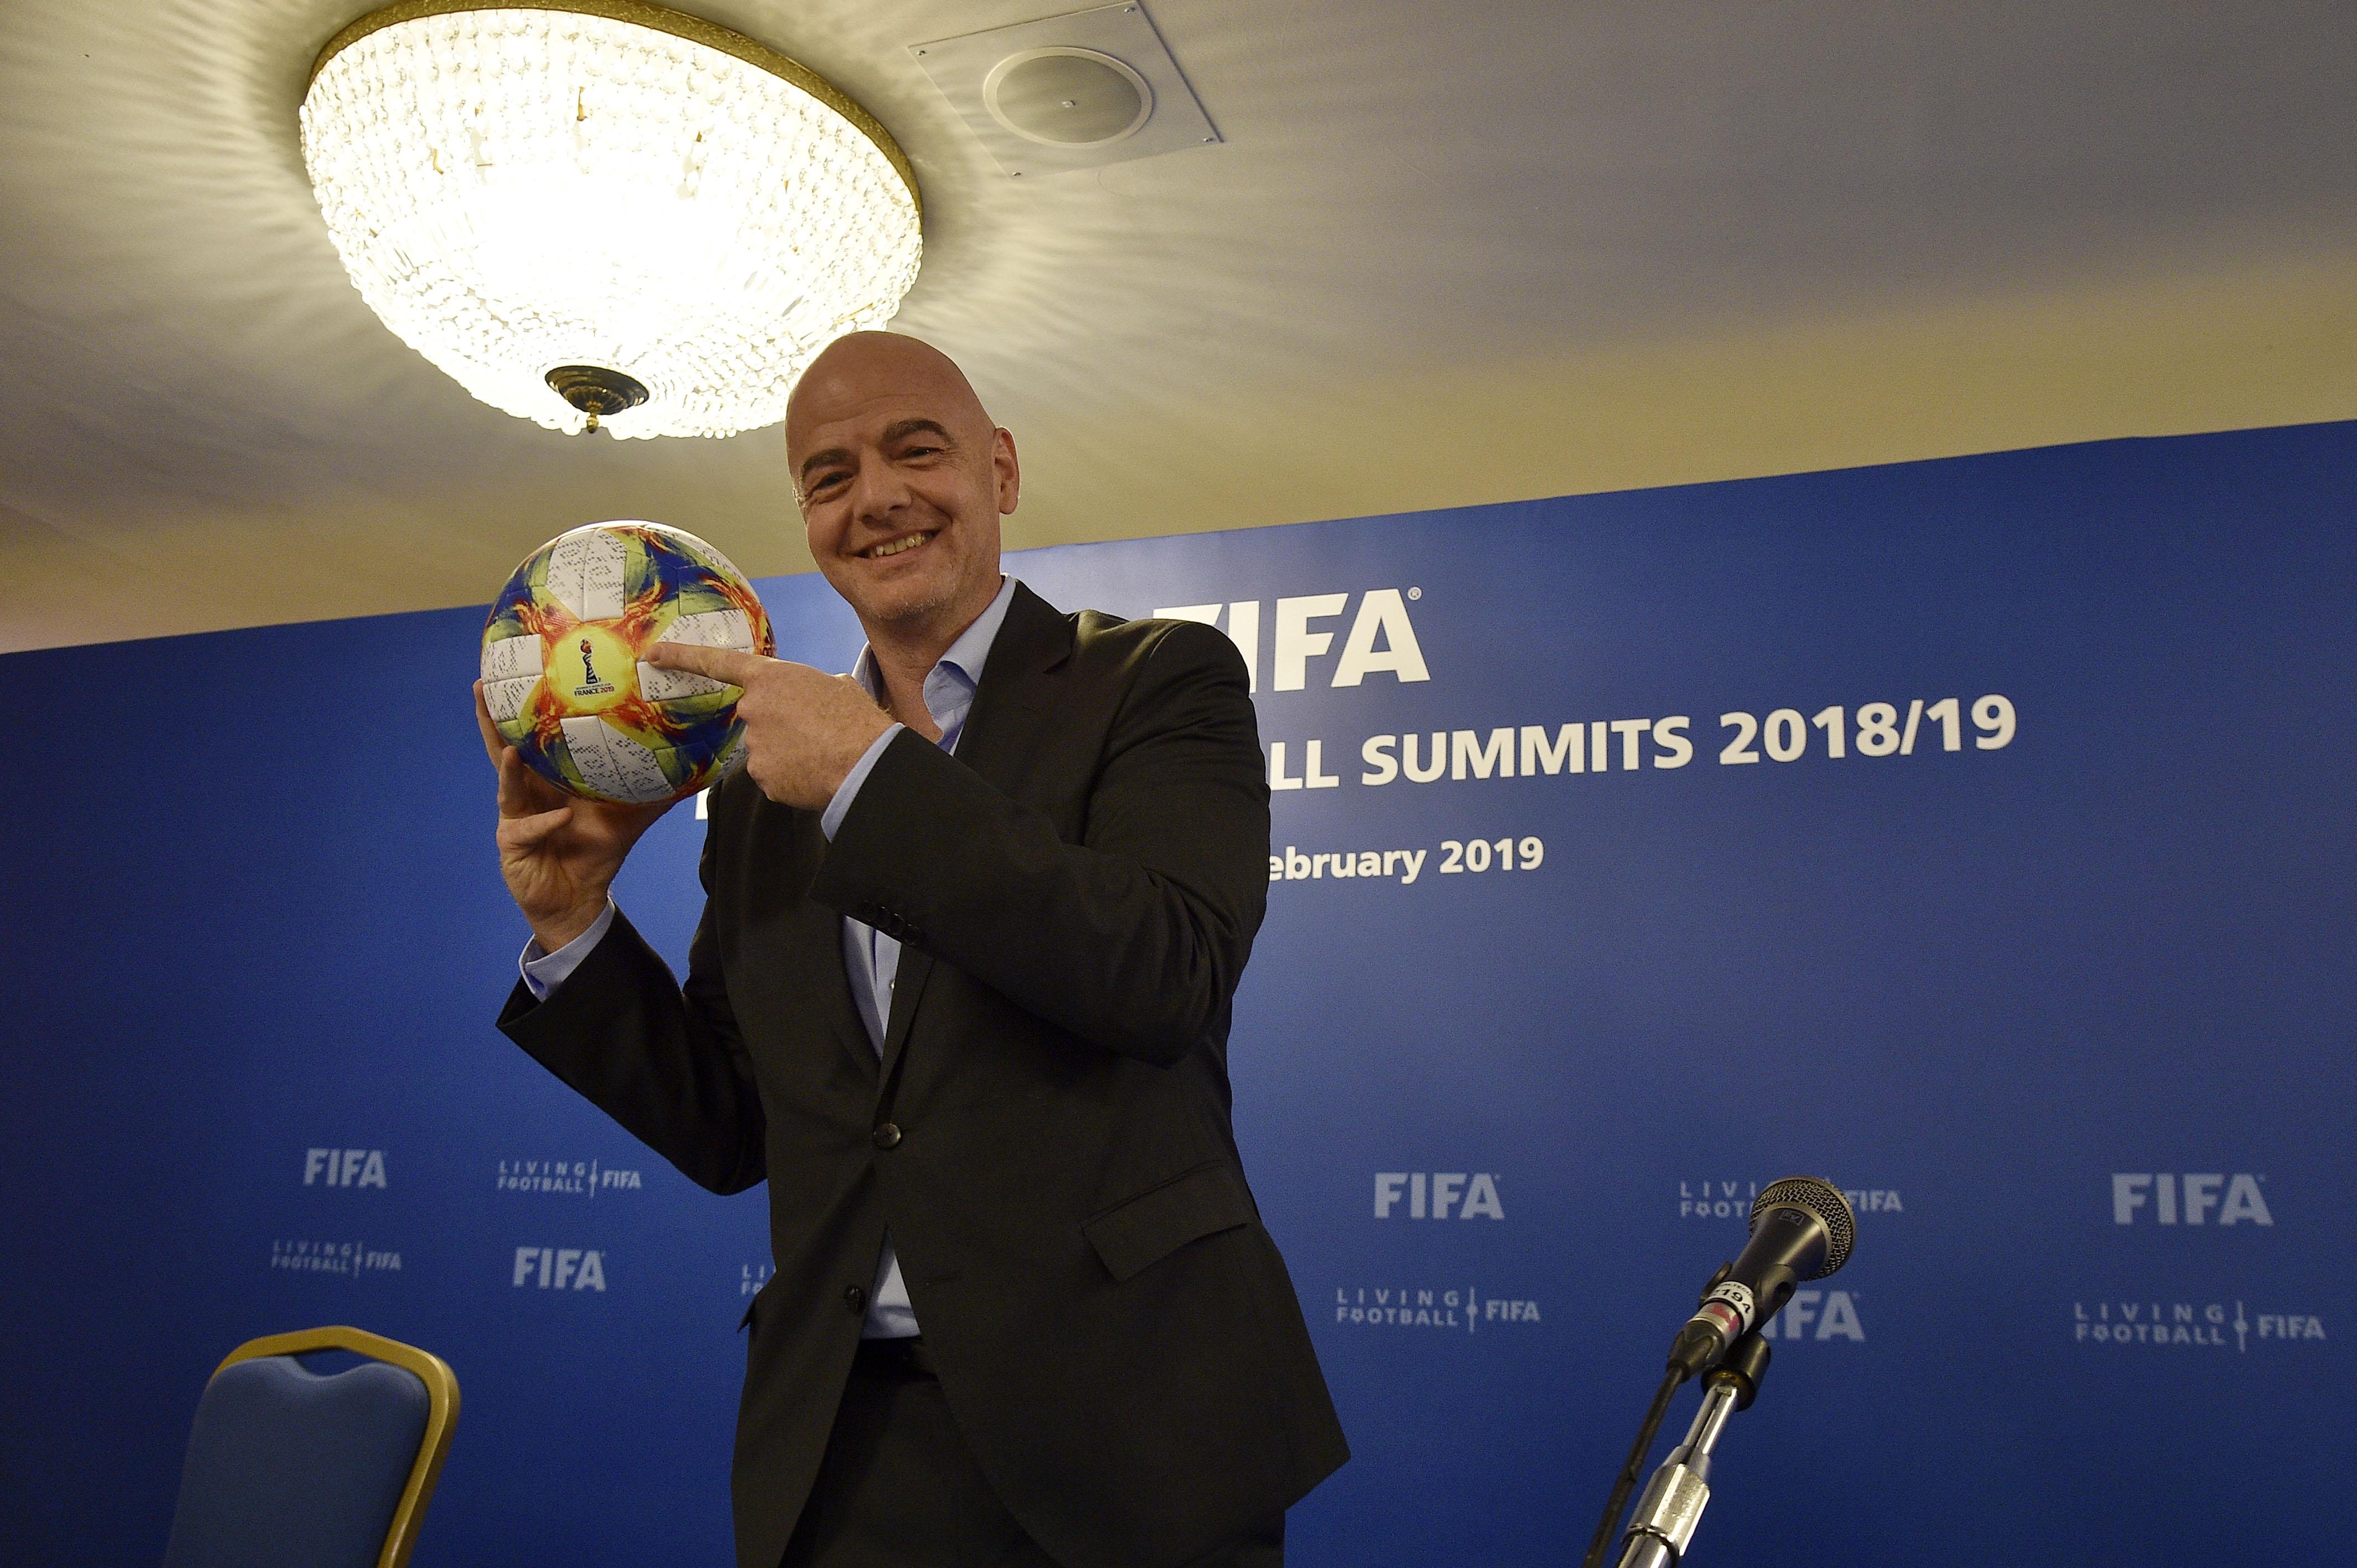 FIFA Executive Football Summit Press Conference